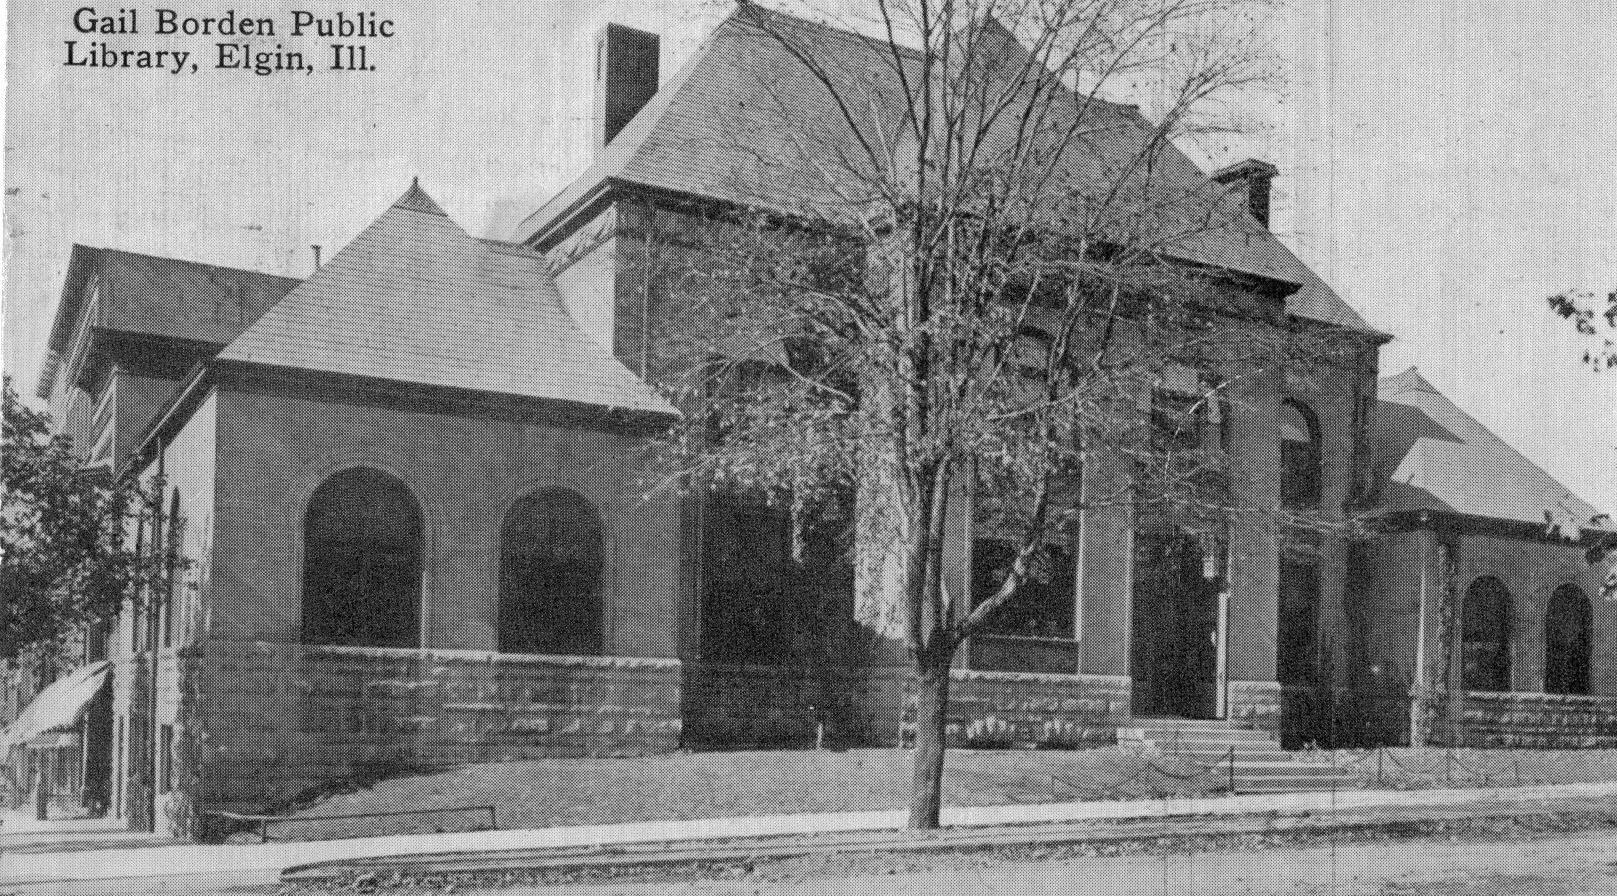 Gail-Borden-Public-Library.jpg